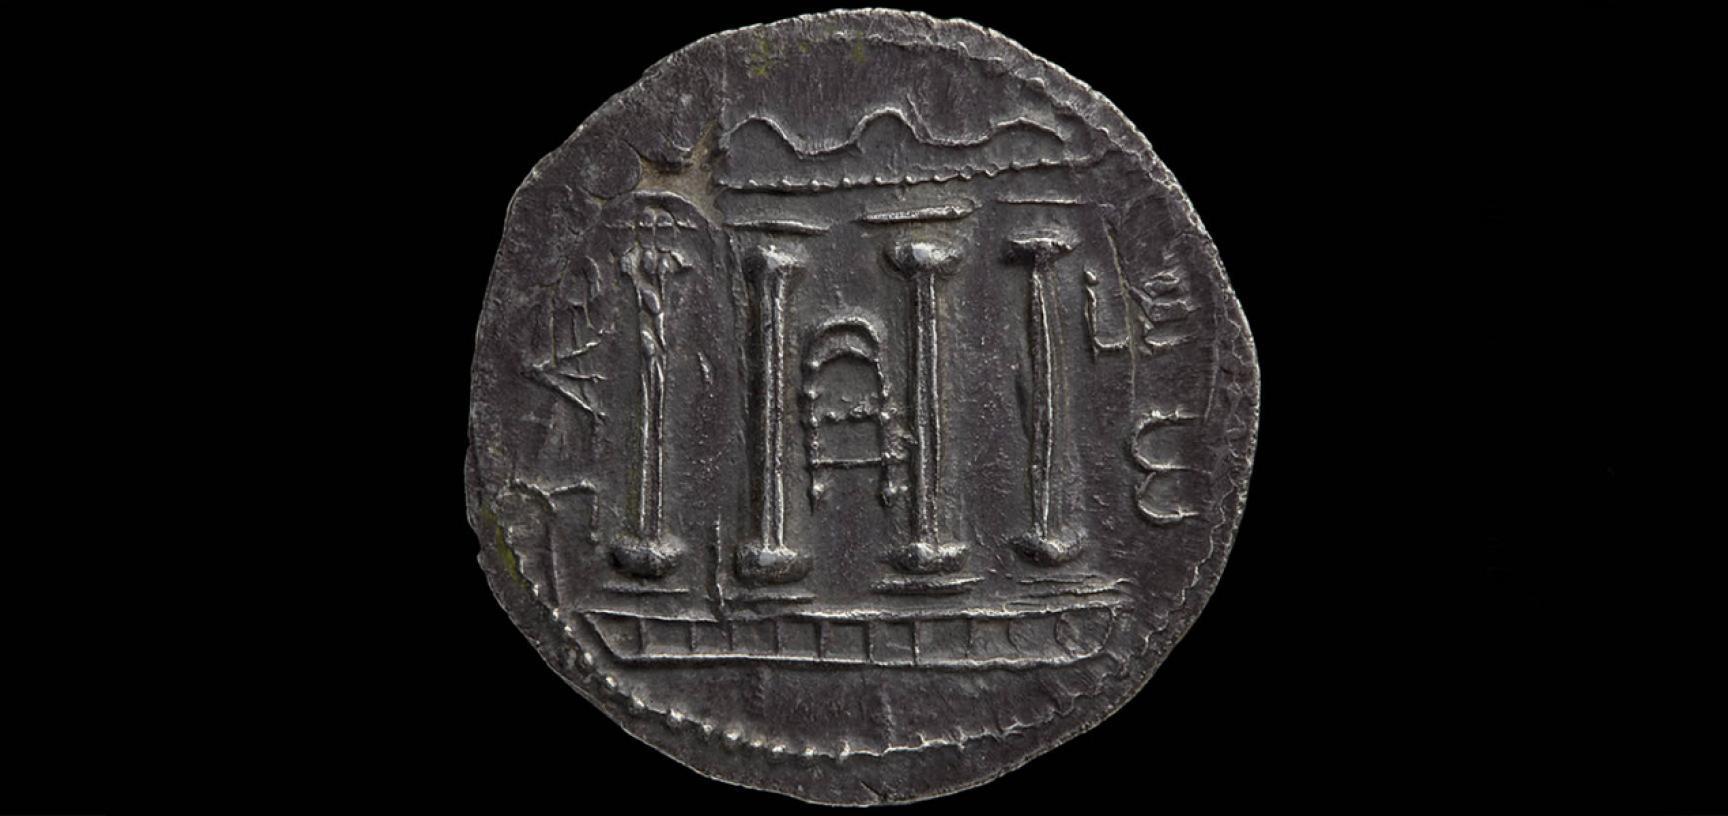 Roman provincial silver coin, Judea mint, AD 132